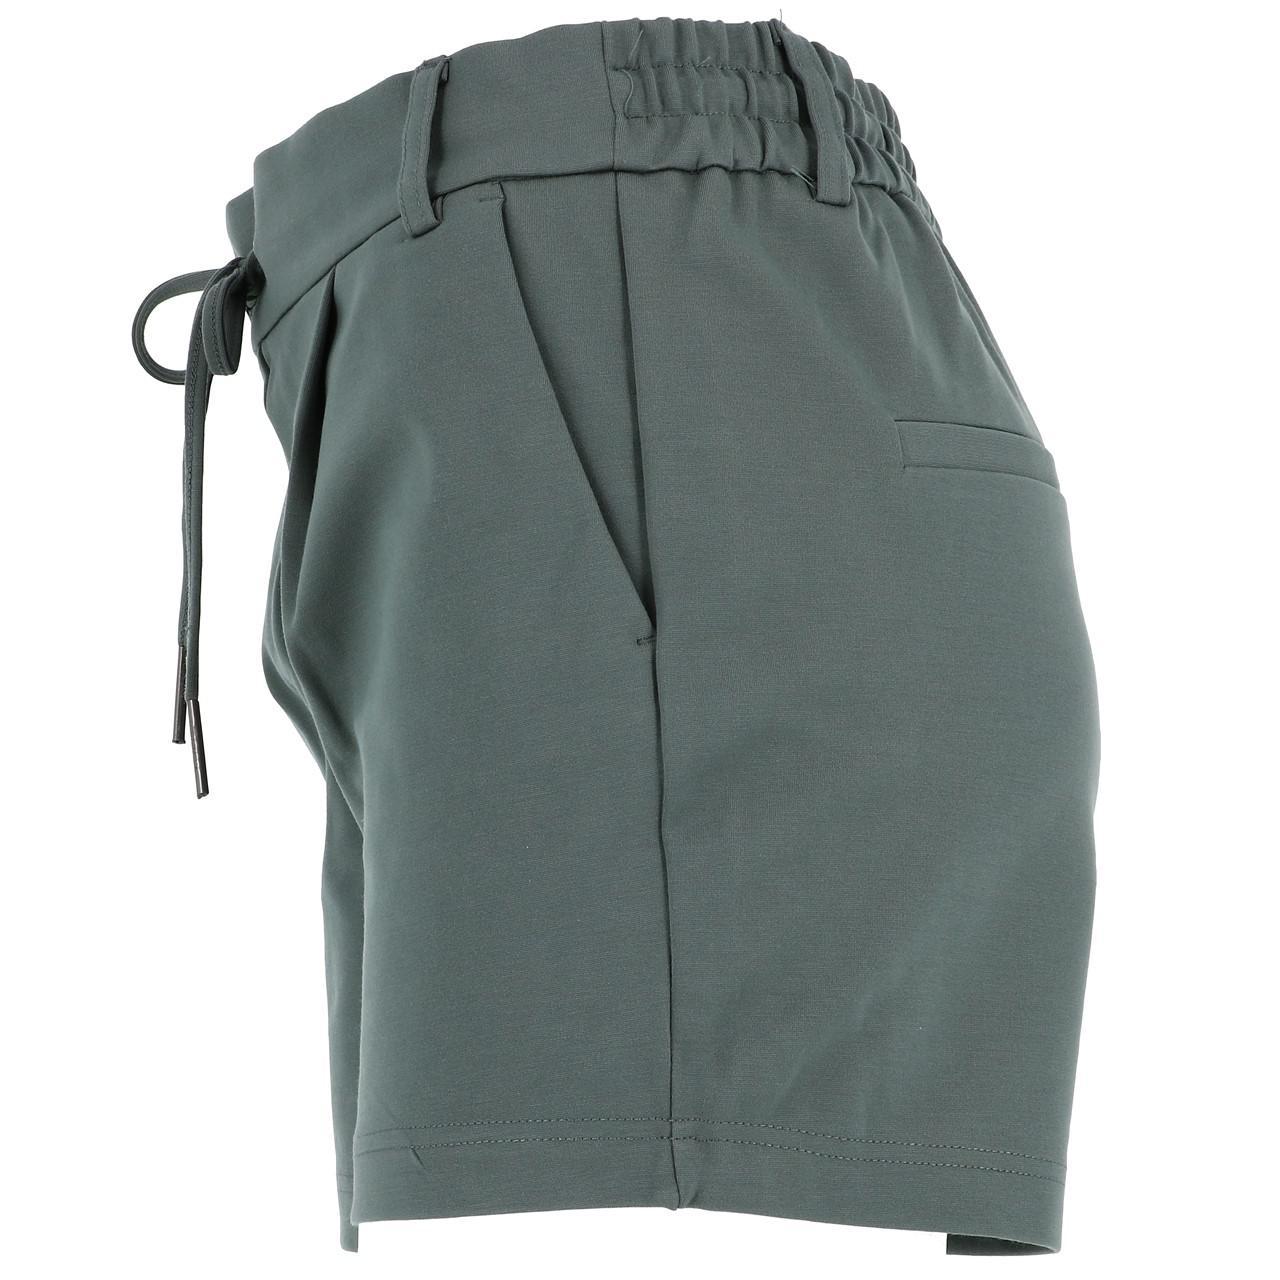 Bermuda-Shorts-Only-Poptrash-Lt-Khaki-Shorts-Green-18701-New thumbnail 2